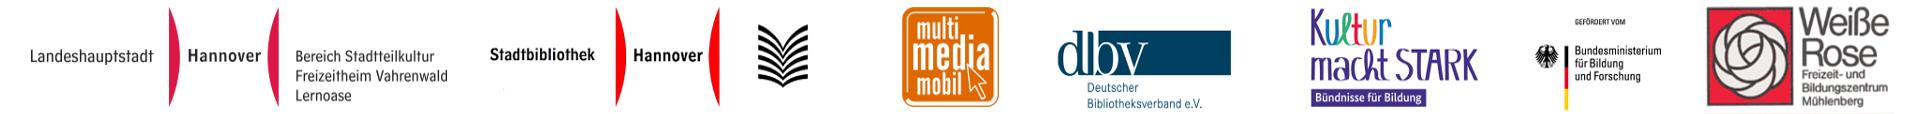 multimediamobil - Region Süd